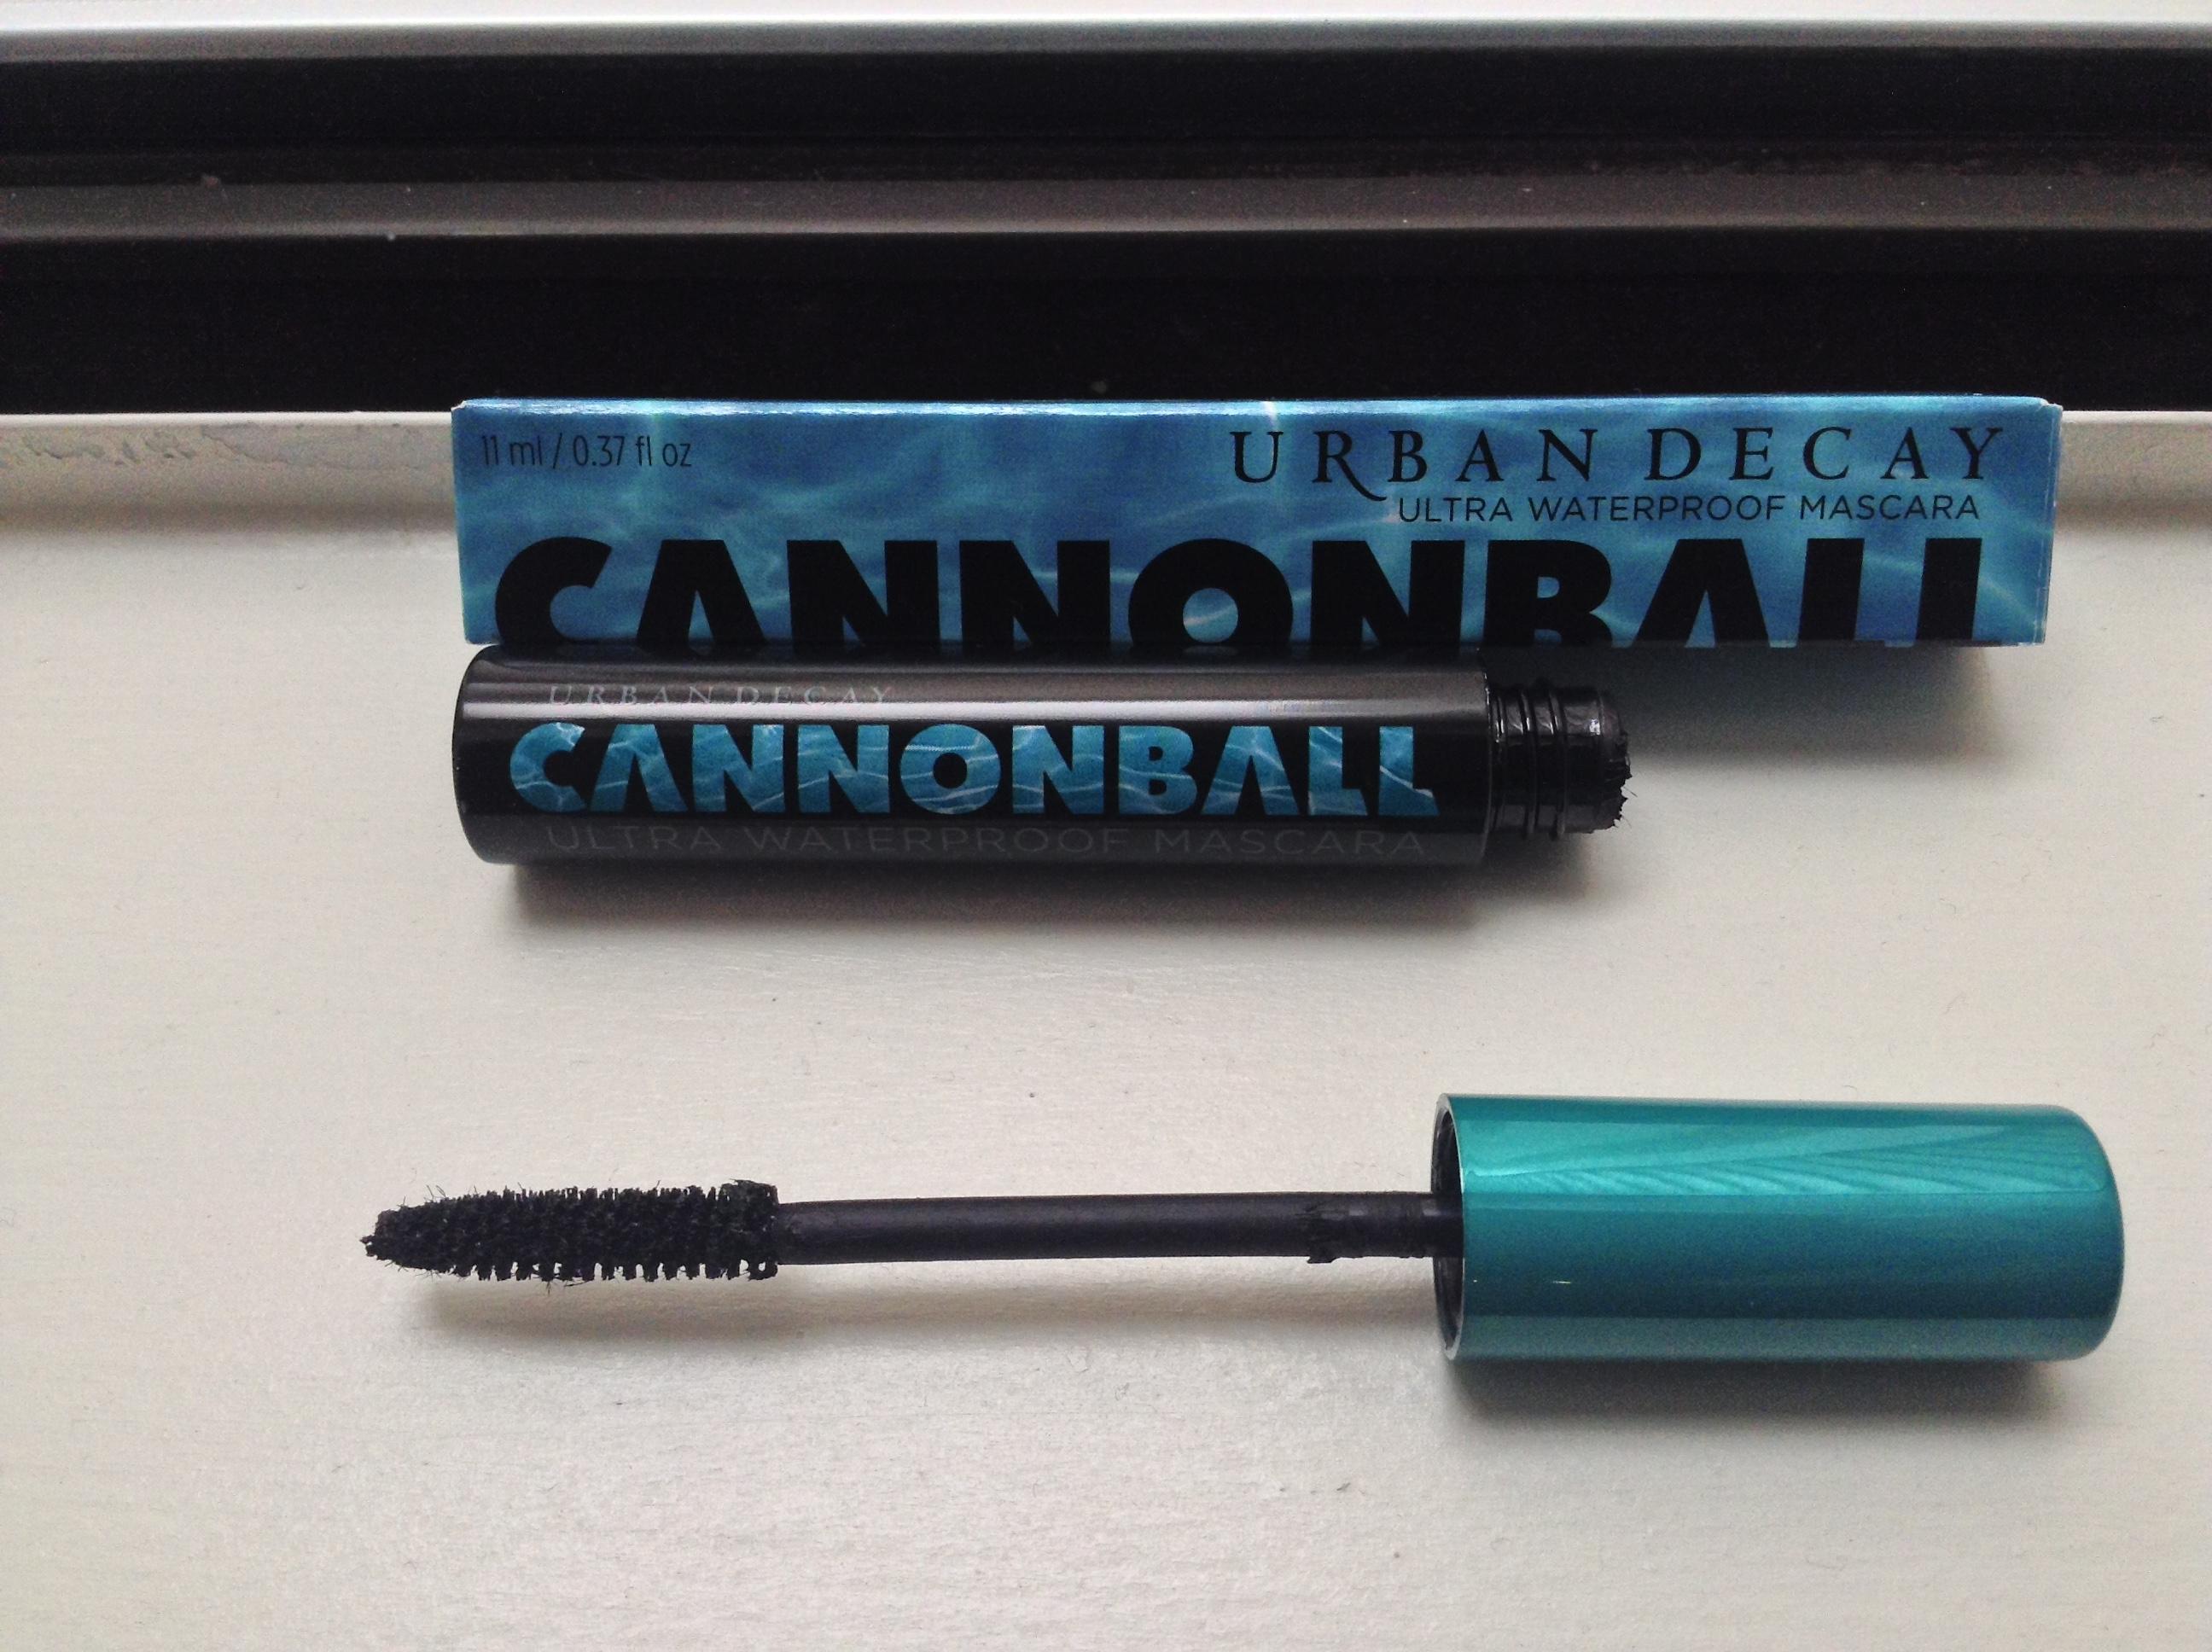 baa6703b218 Waterproof Mascara: I'm Trying Urban Decay 'Cannonball' Mascara ...